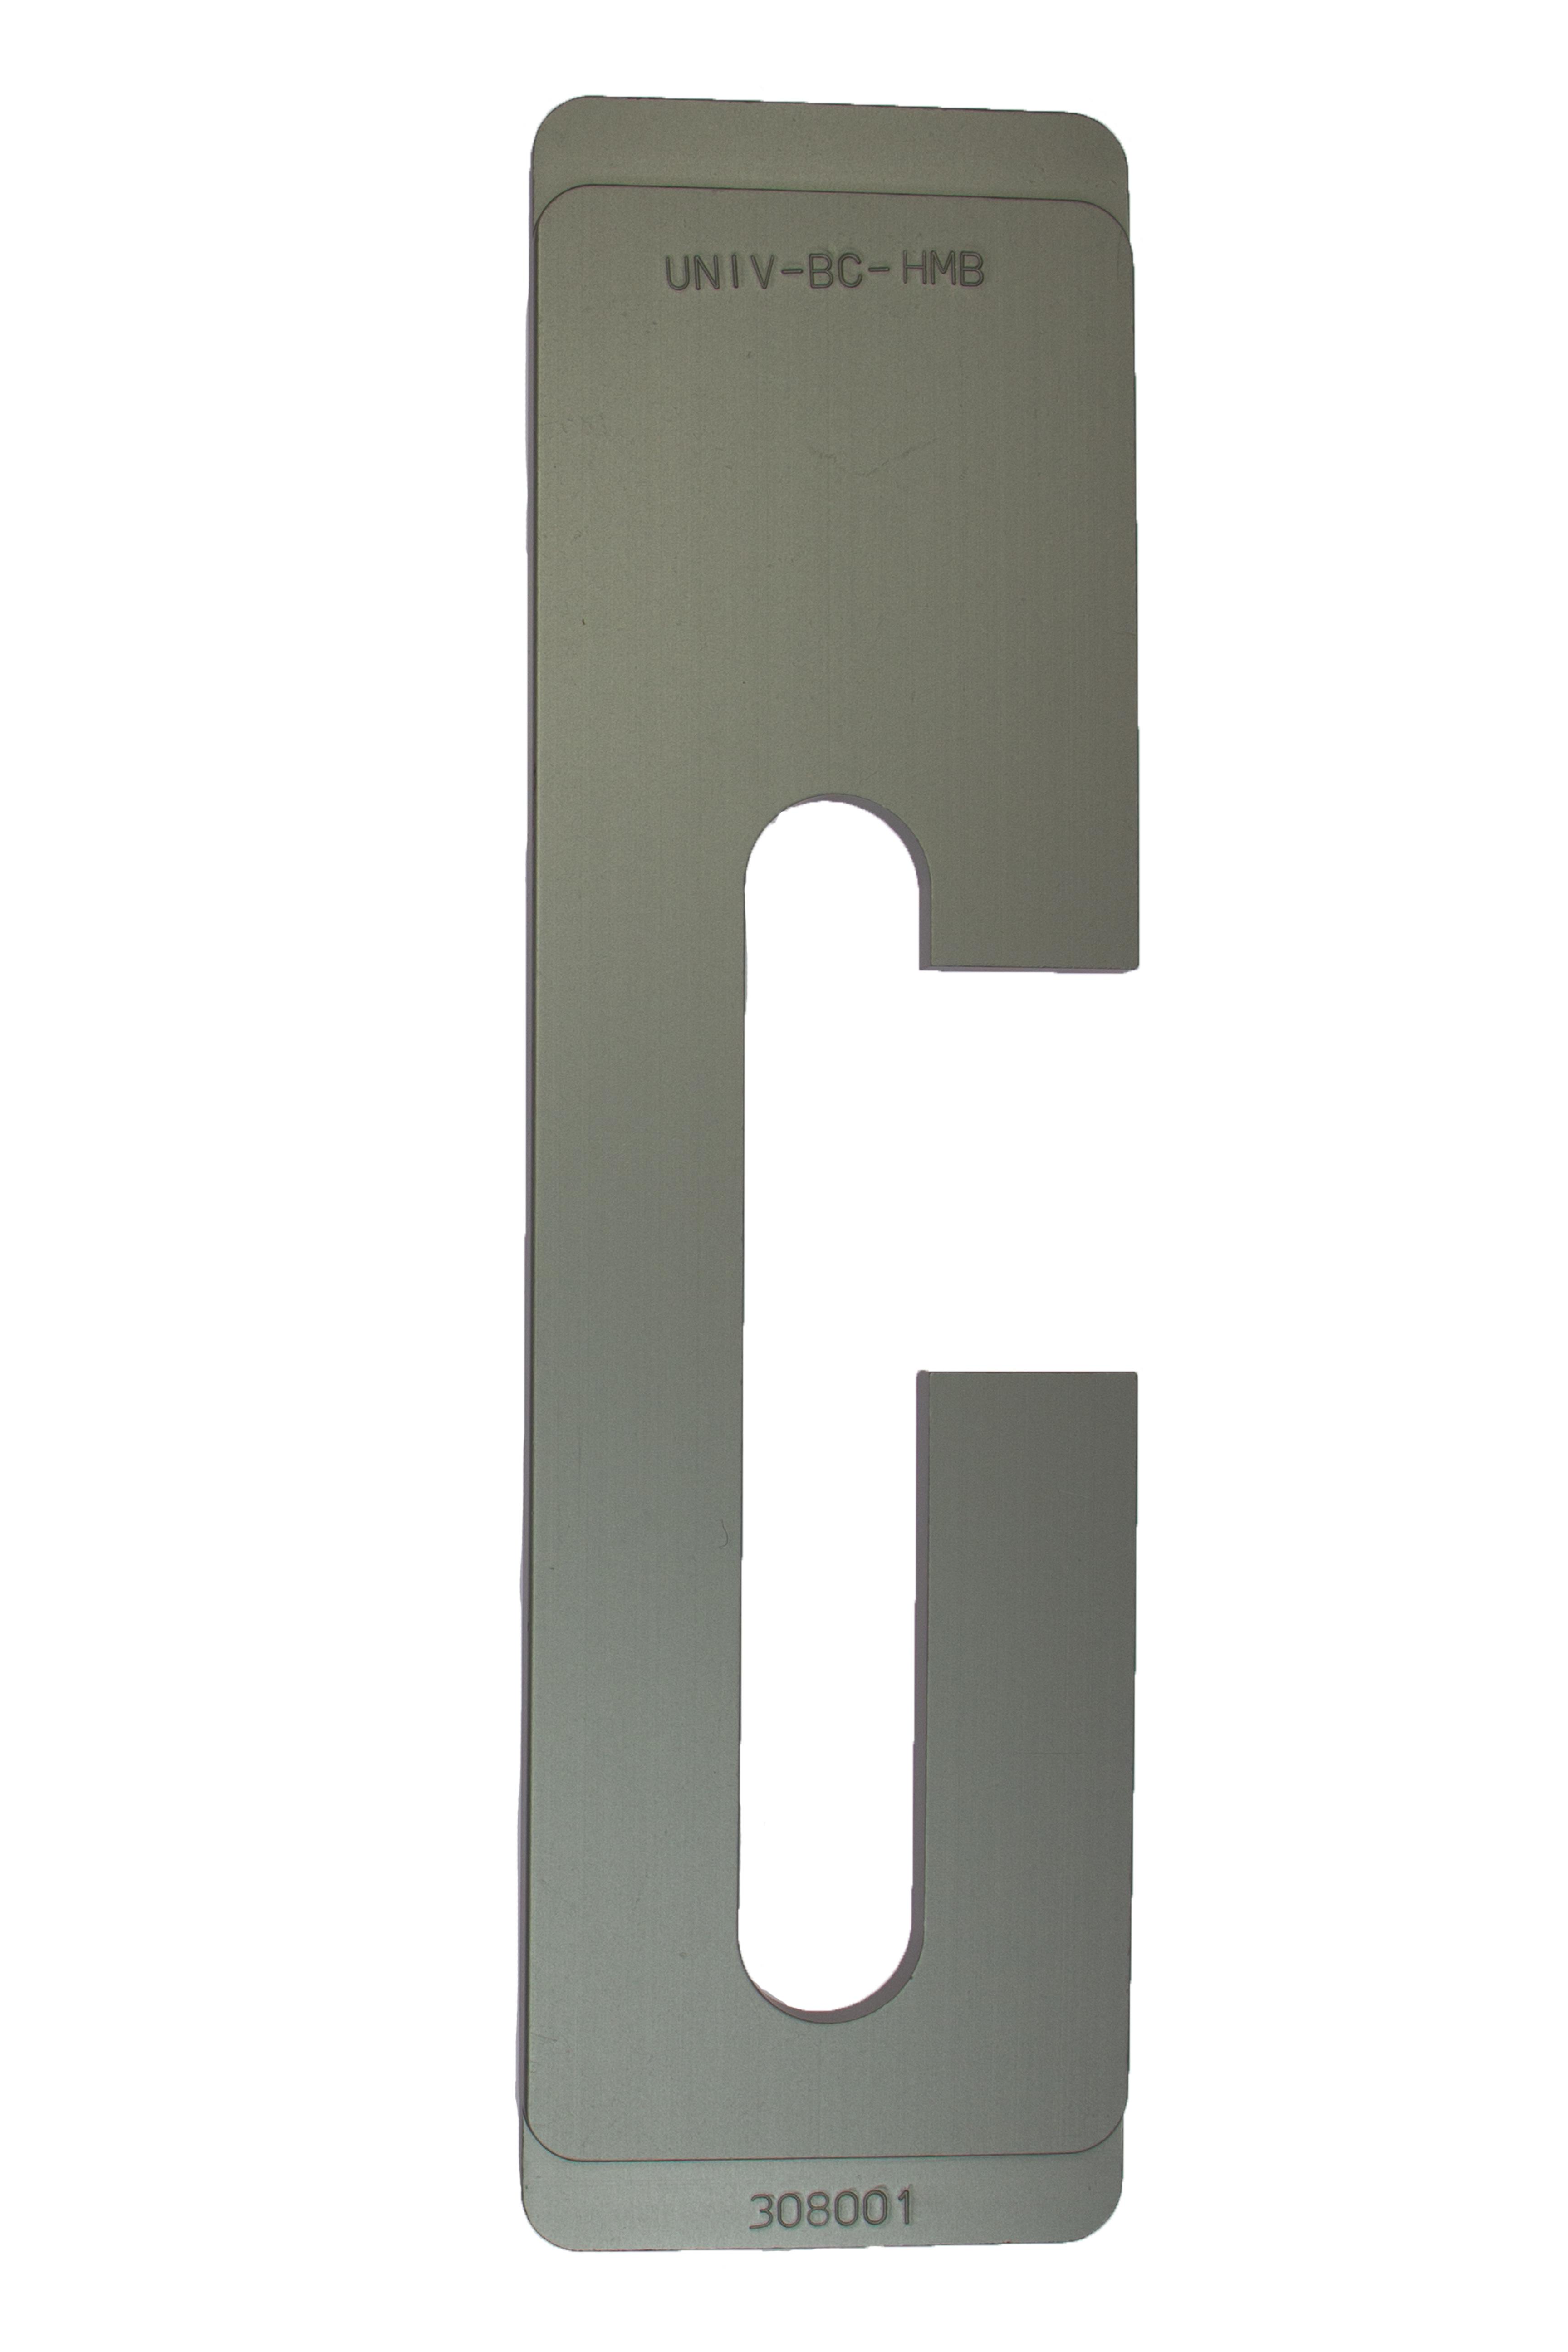 Inlegcassette HMB verstelbare dag- en nachtsluitplaat b-c